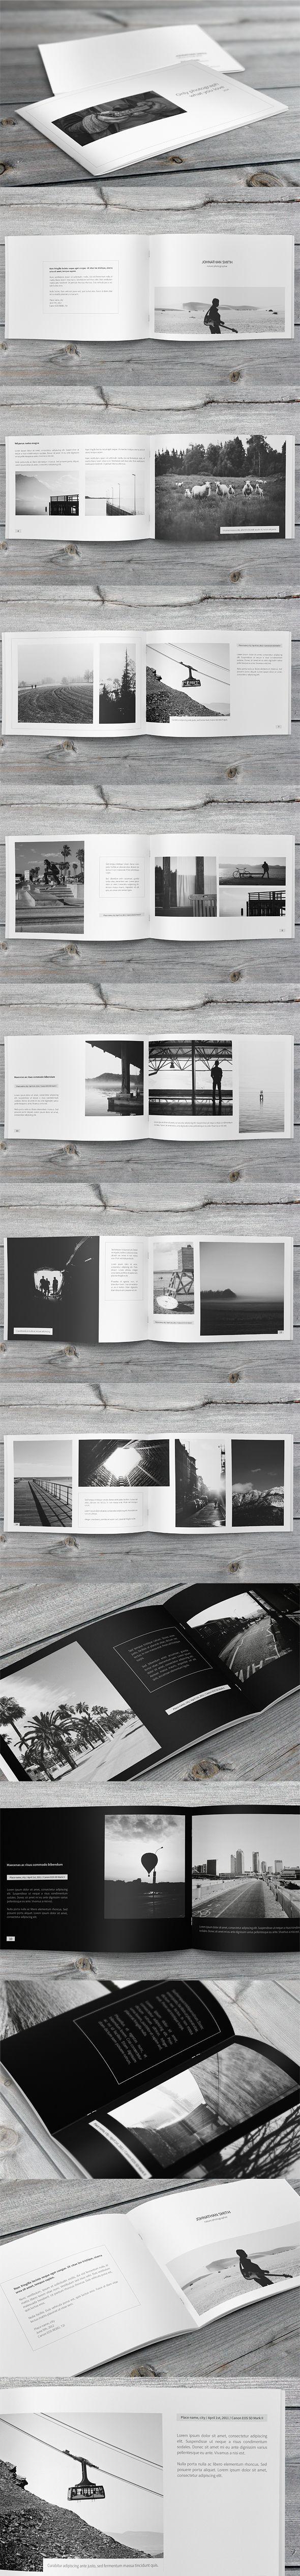 Minimalfolio Photography Portfolio A4 Brochure #4 on Behance More